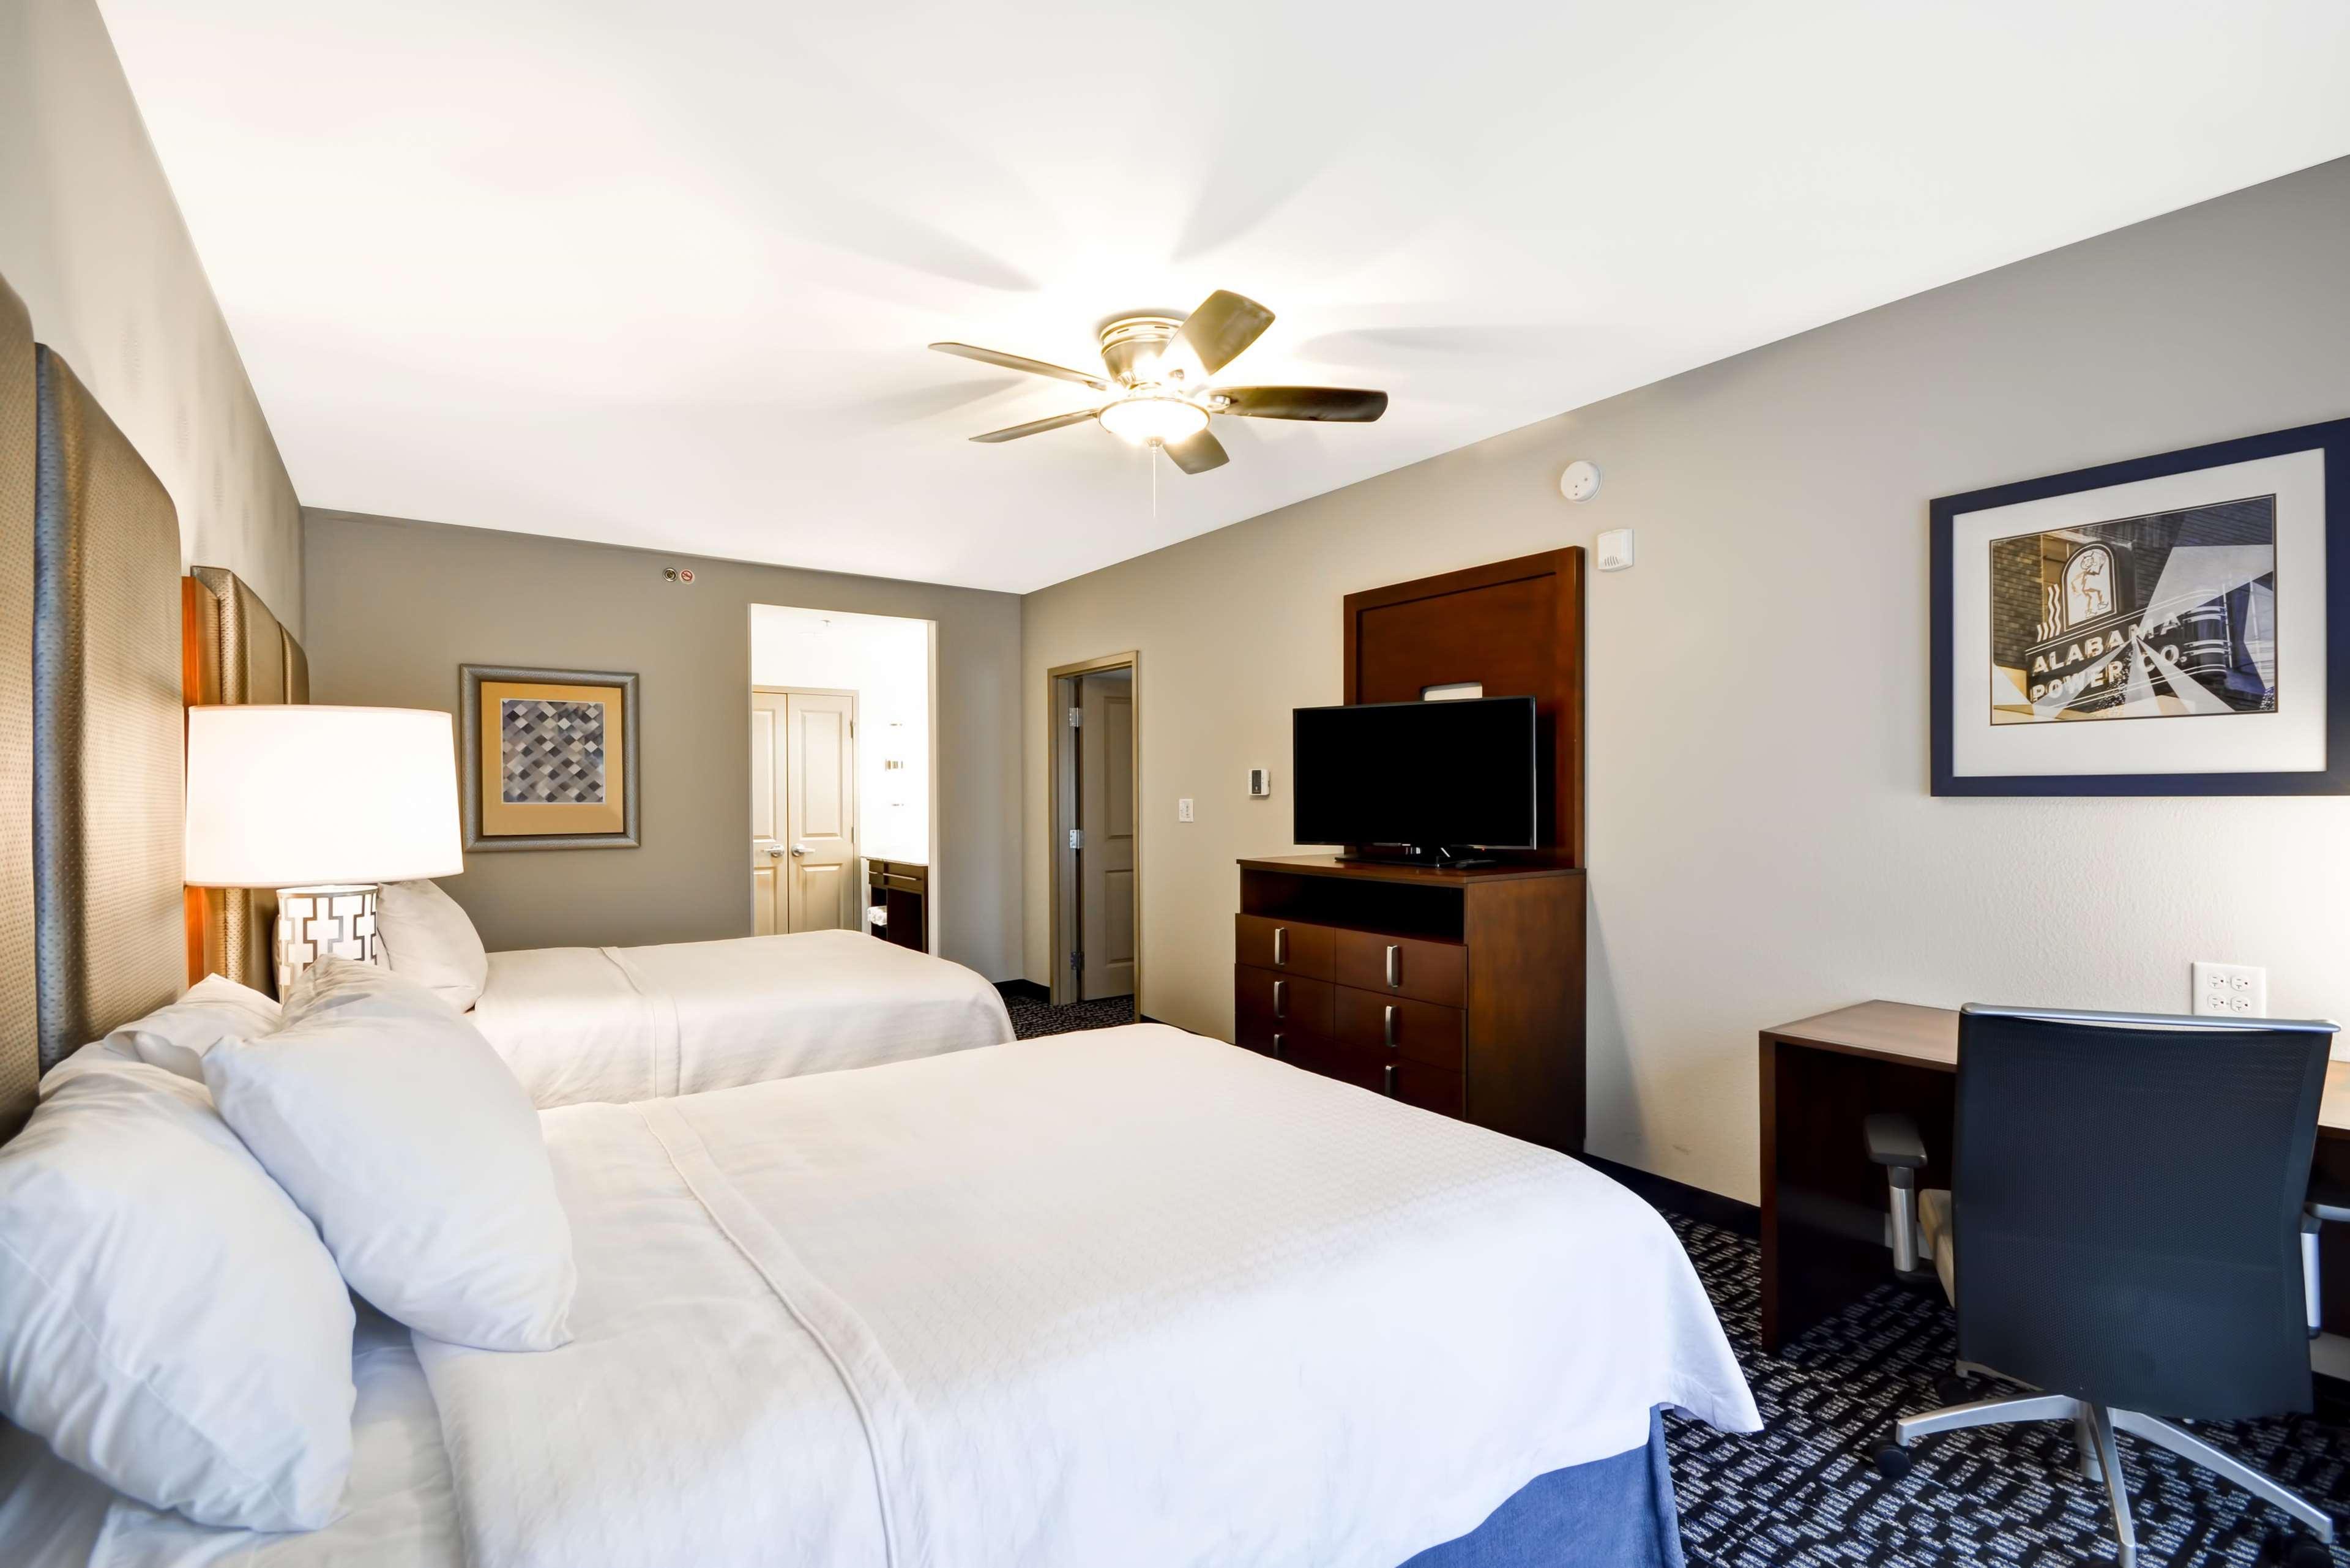 Homewood Suites by Hilton Birmingham Downtown Near UAB image 15